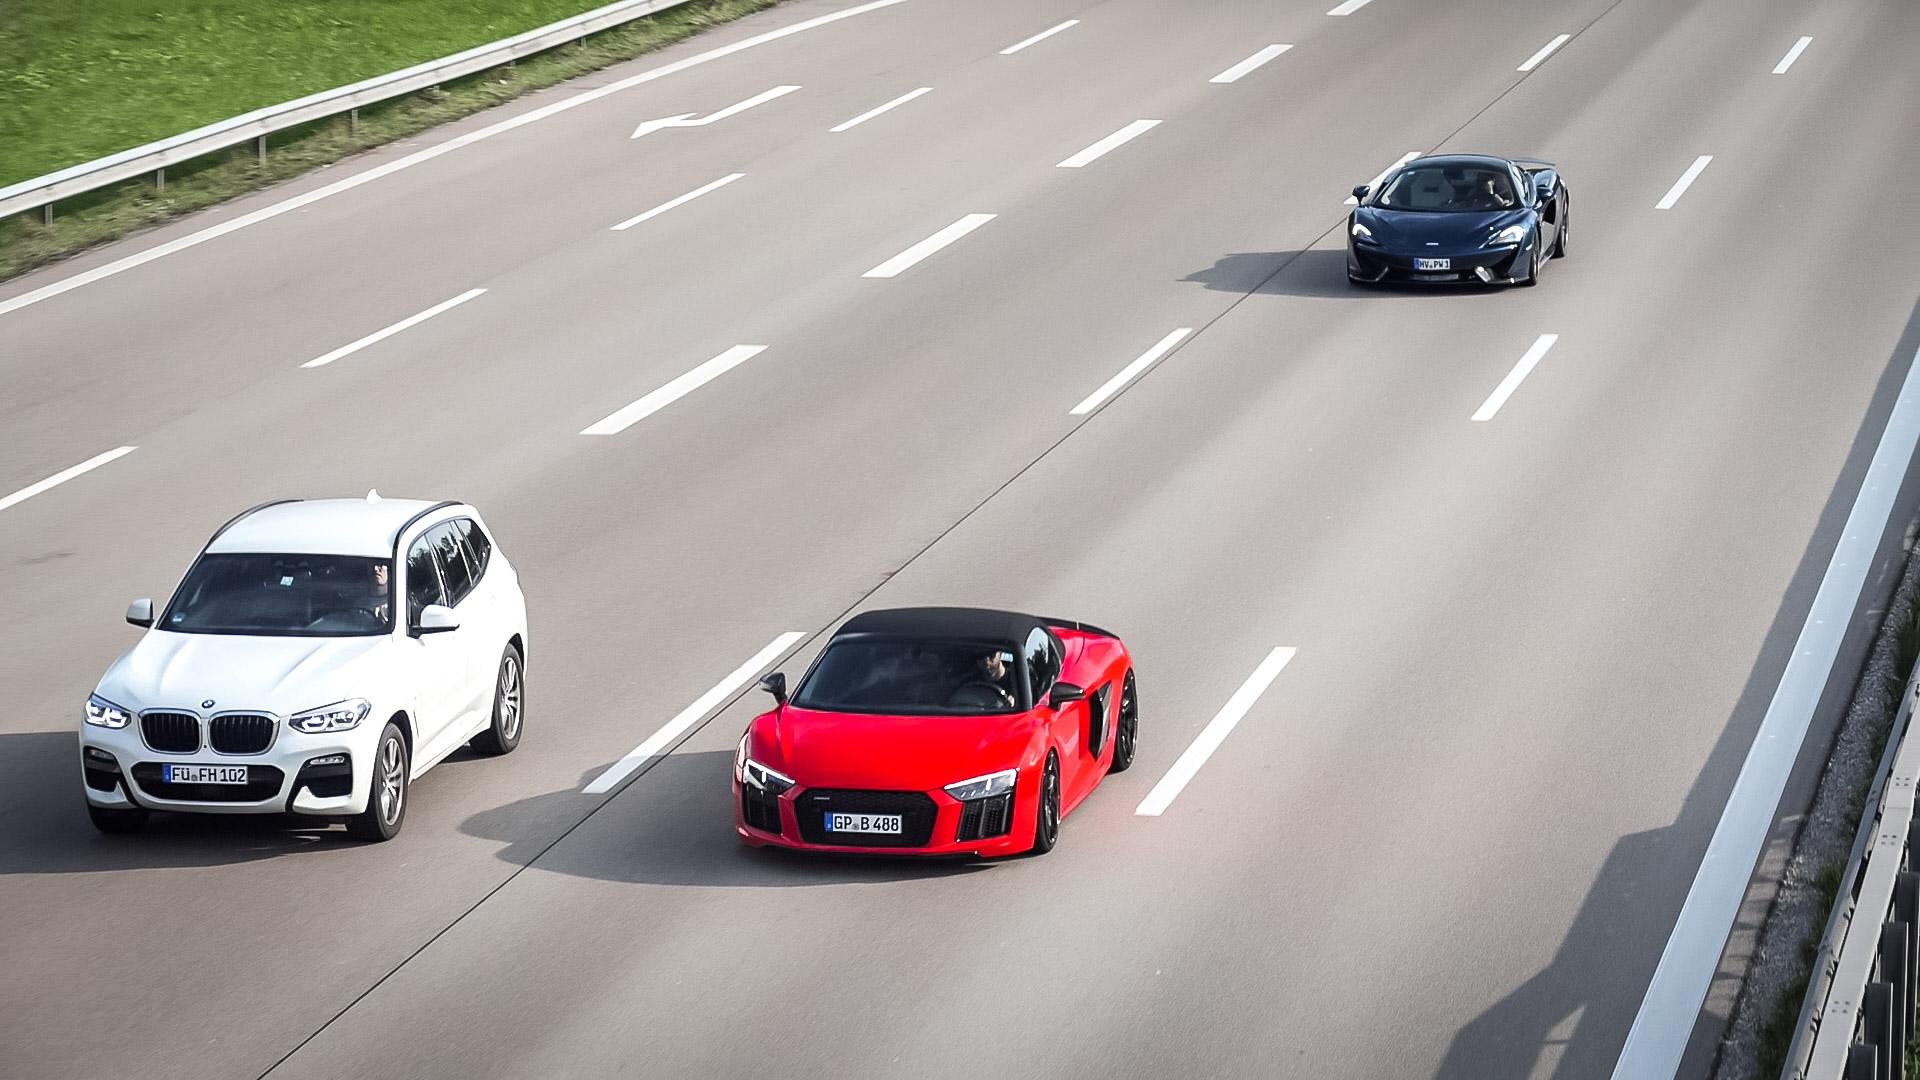 Audi R8 V10 Spyder - GP-B-488